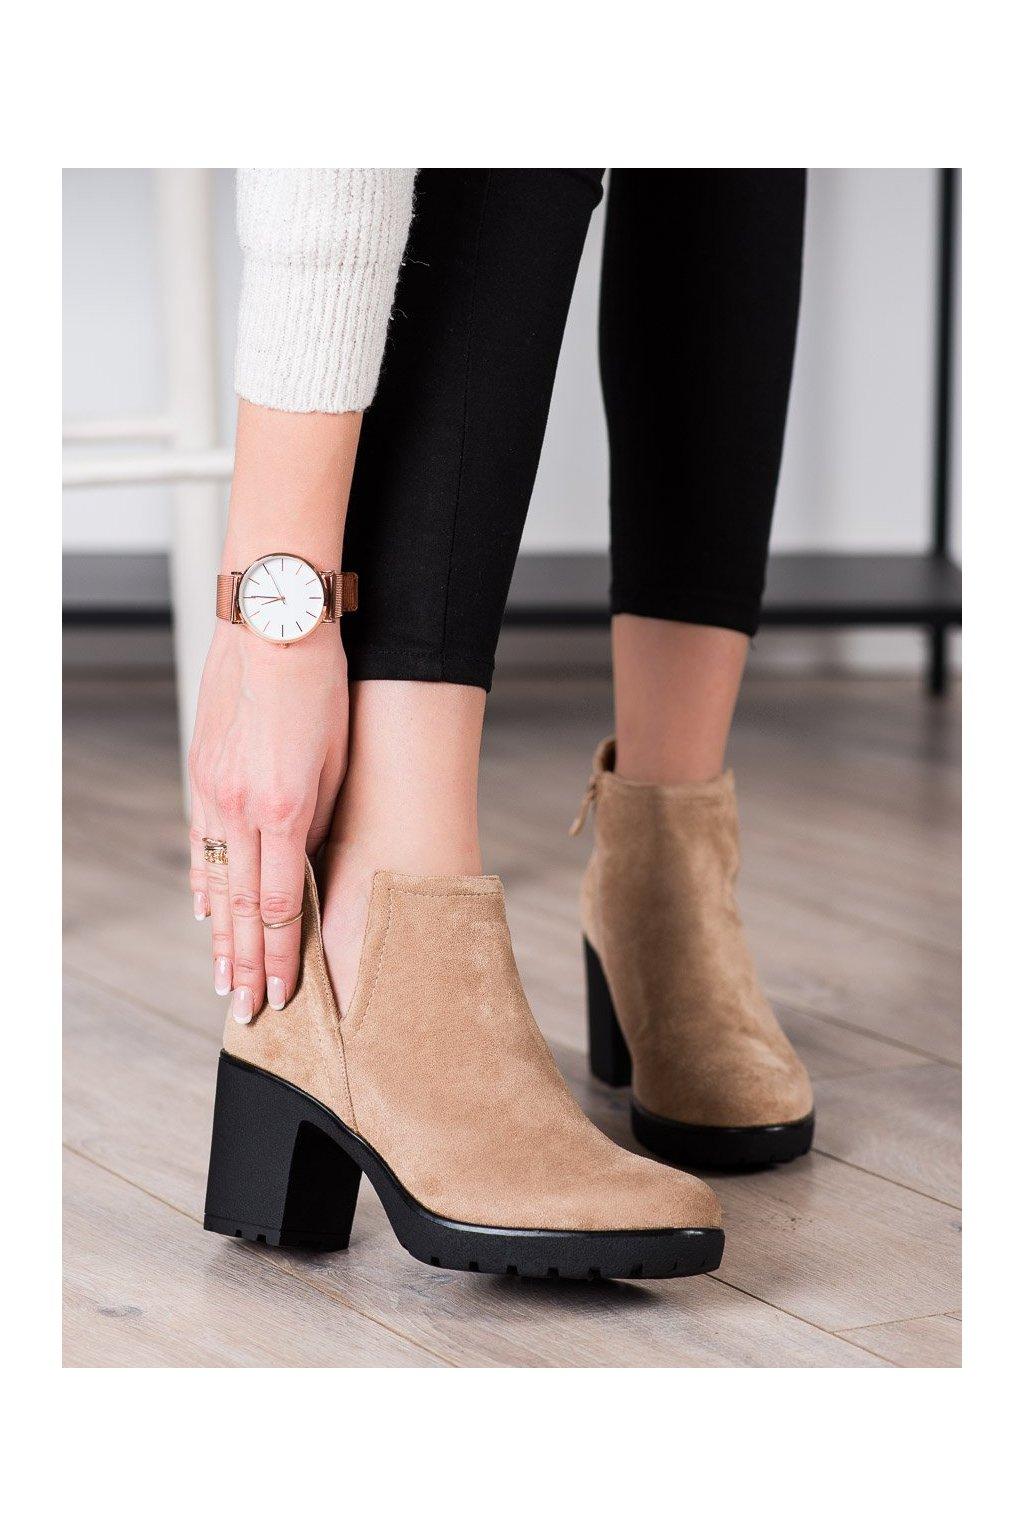 Hnedé dámske topánky Bella paris kod A5507KH